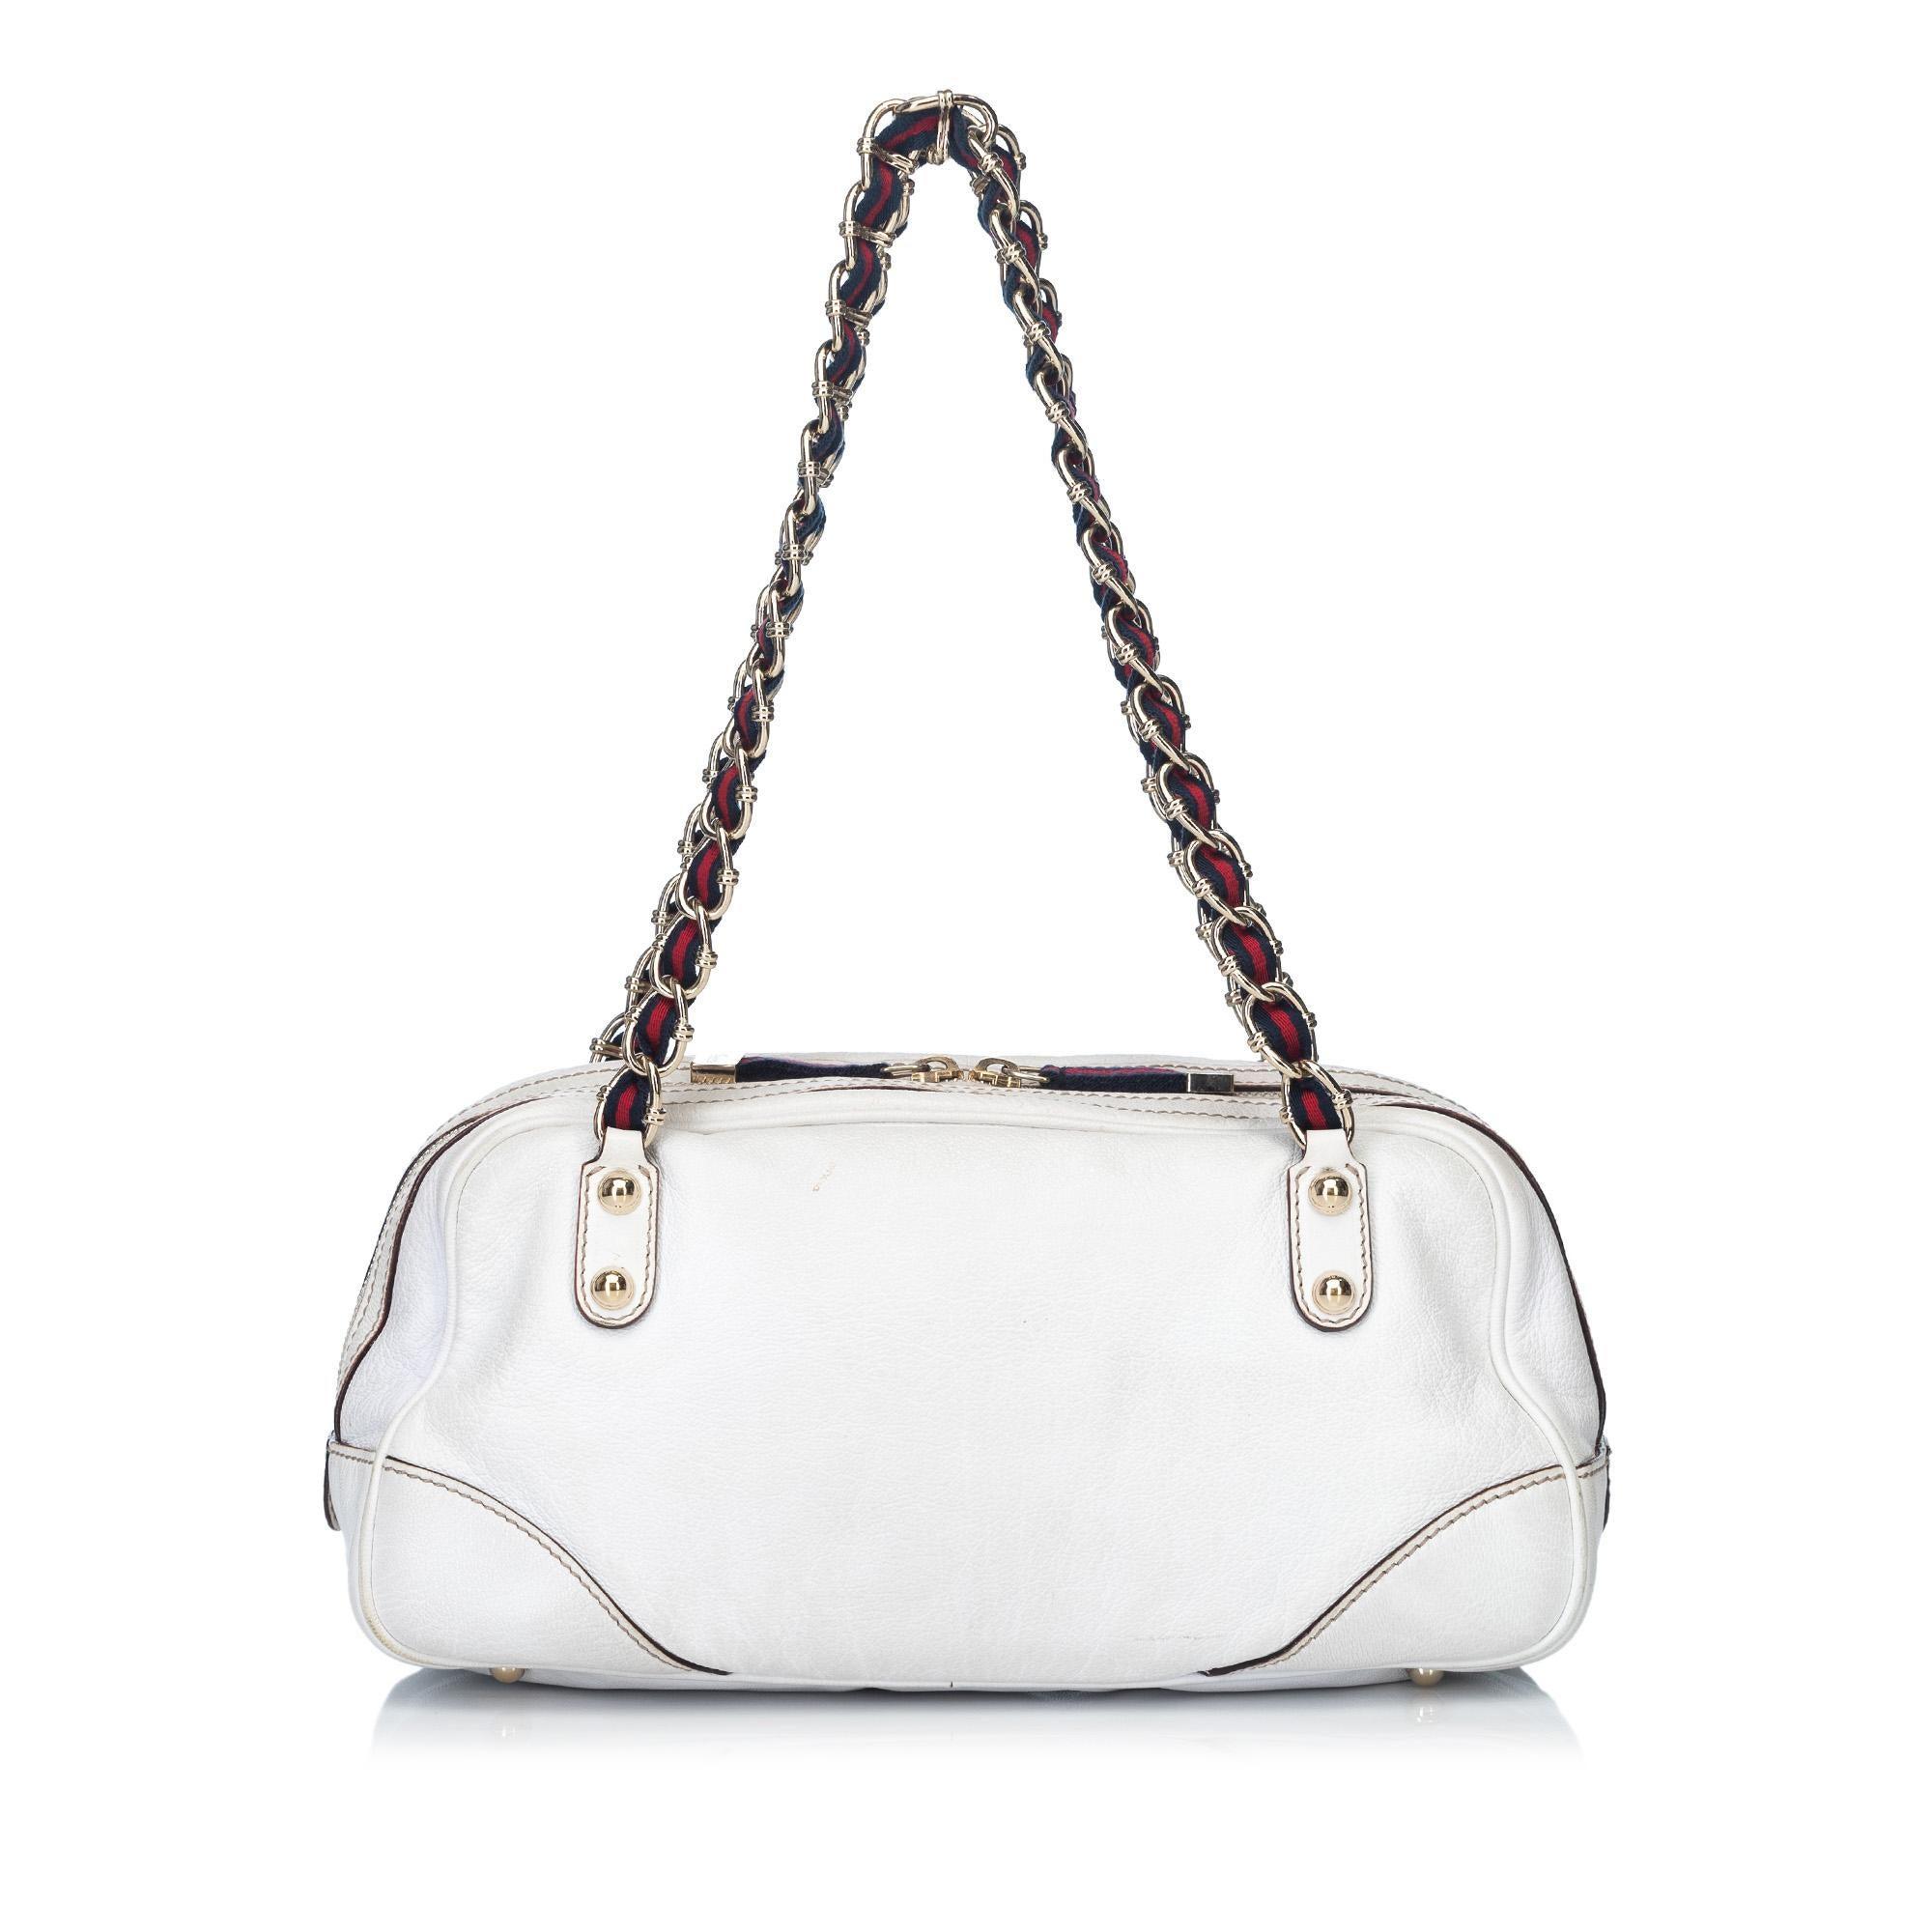 7f54ec4633d Gucci White Leather Capri Shoulder Bag at 1stdibs